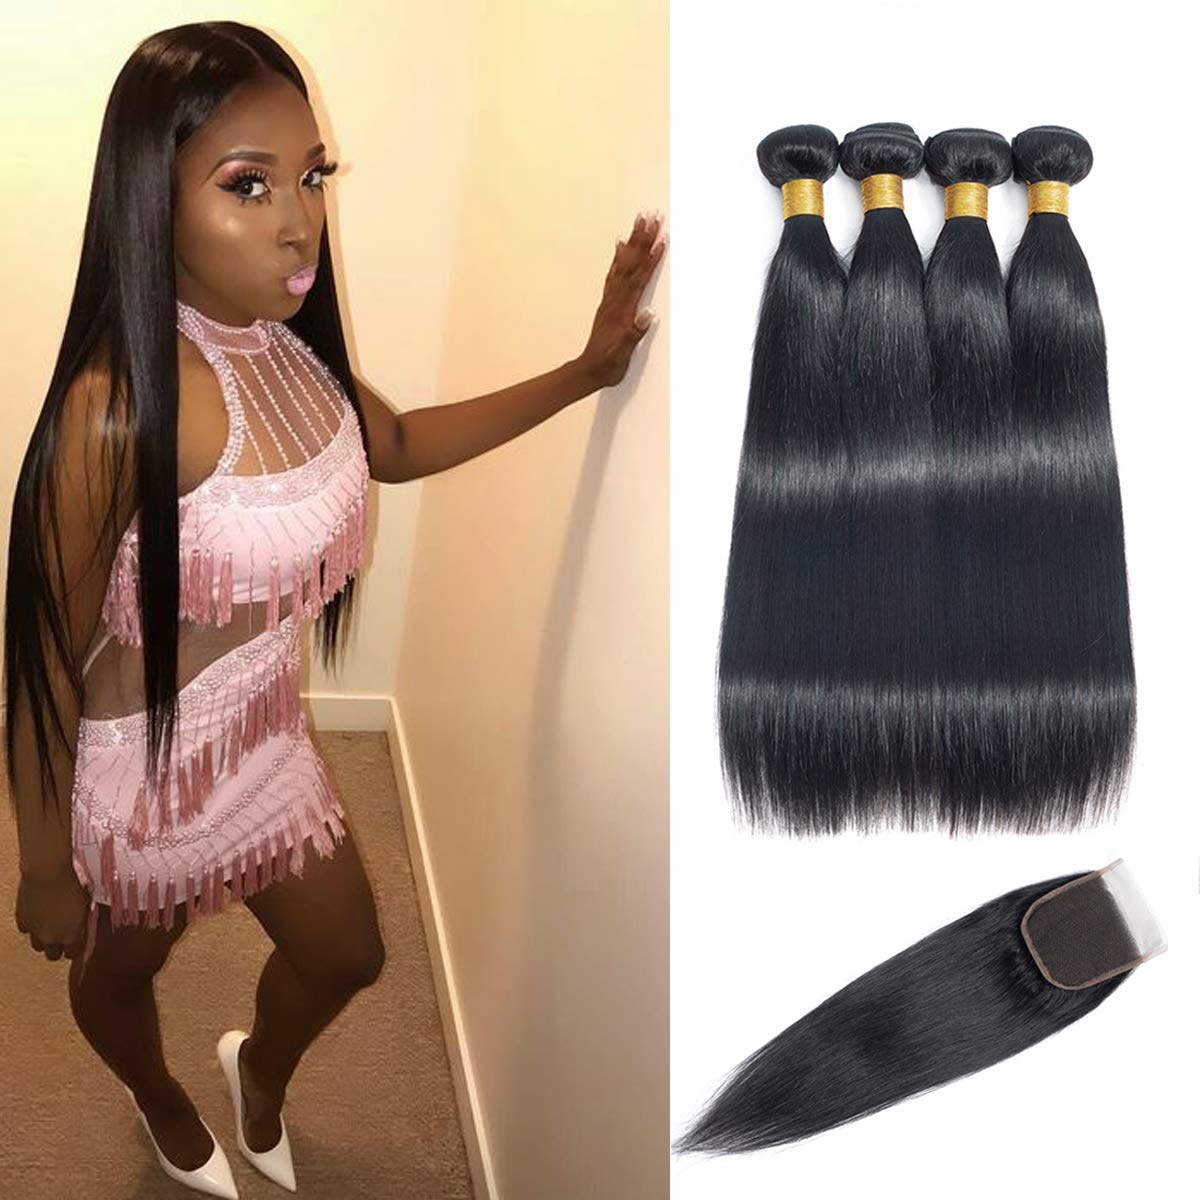 Brazilian Virgin Hair Straight Bundles with Closure Double Weft Human Hair Bundles With Closure 9A Mink Brazilian Hair With Closure Free Part(22'' 24'' 26'' 28'' with 20'')